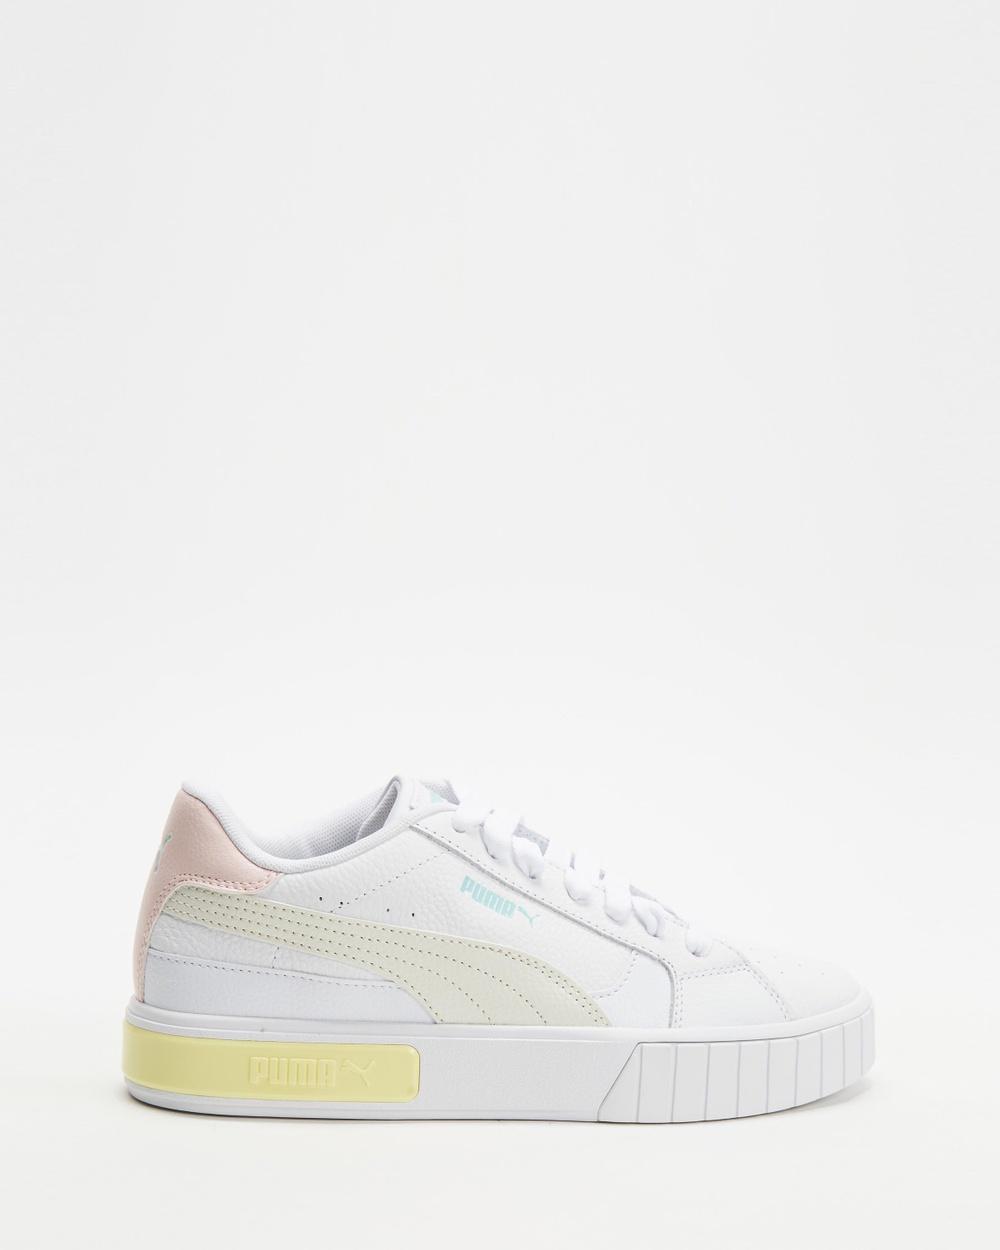 Puma Cali Star Sneakers Women's Lifestyle Puma White, Vaporous Grey & Yellow Pear